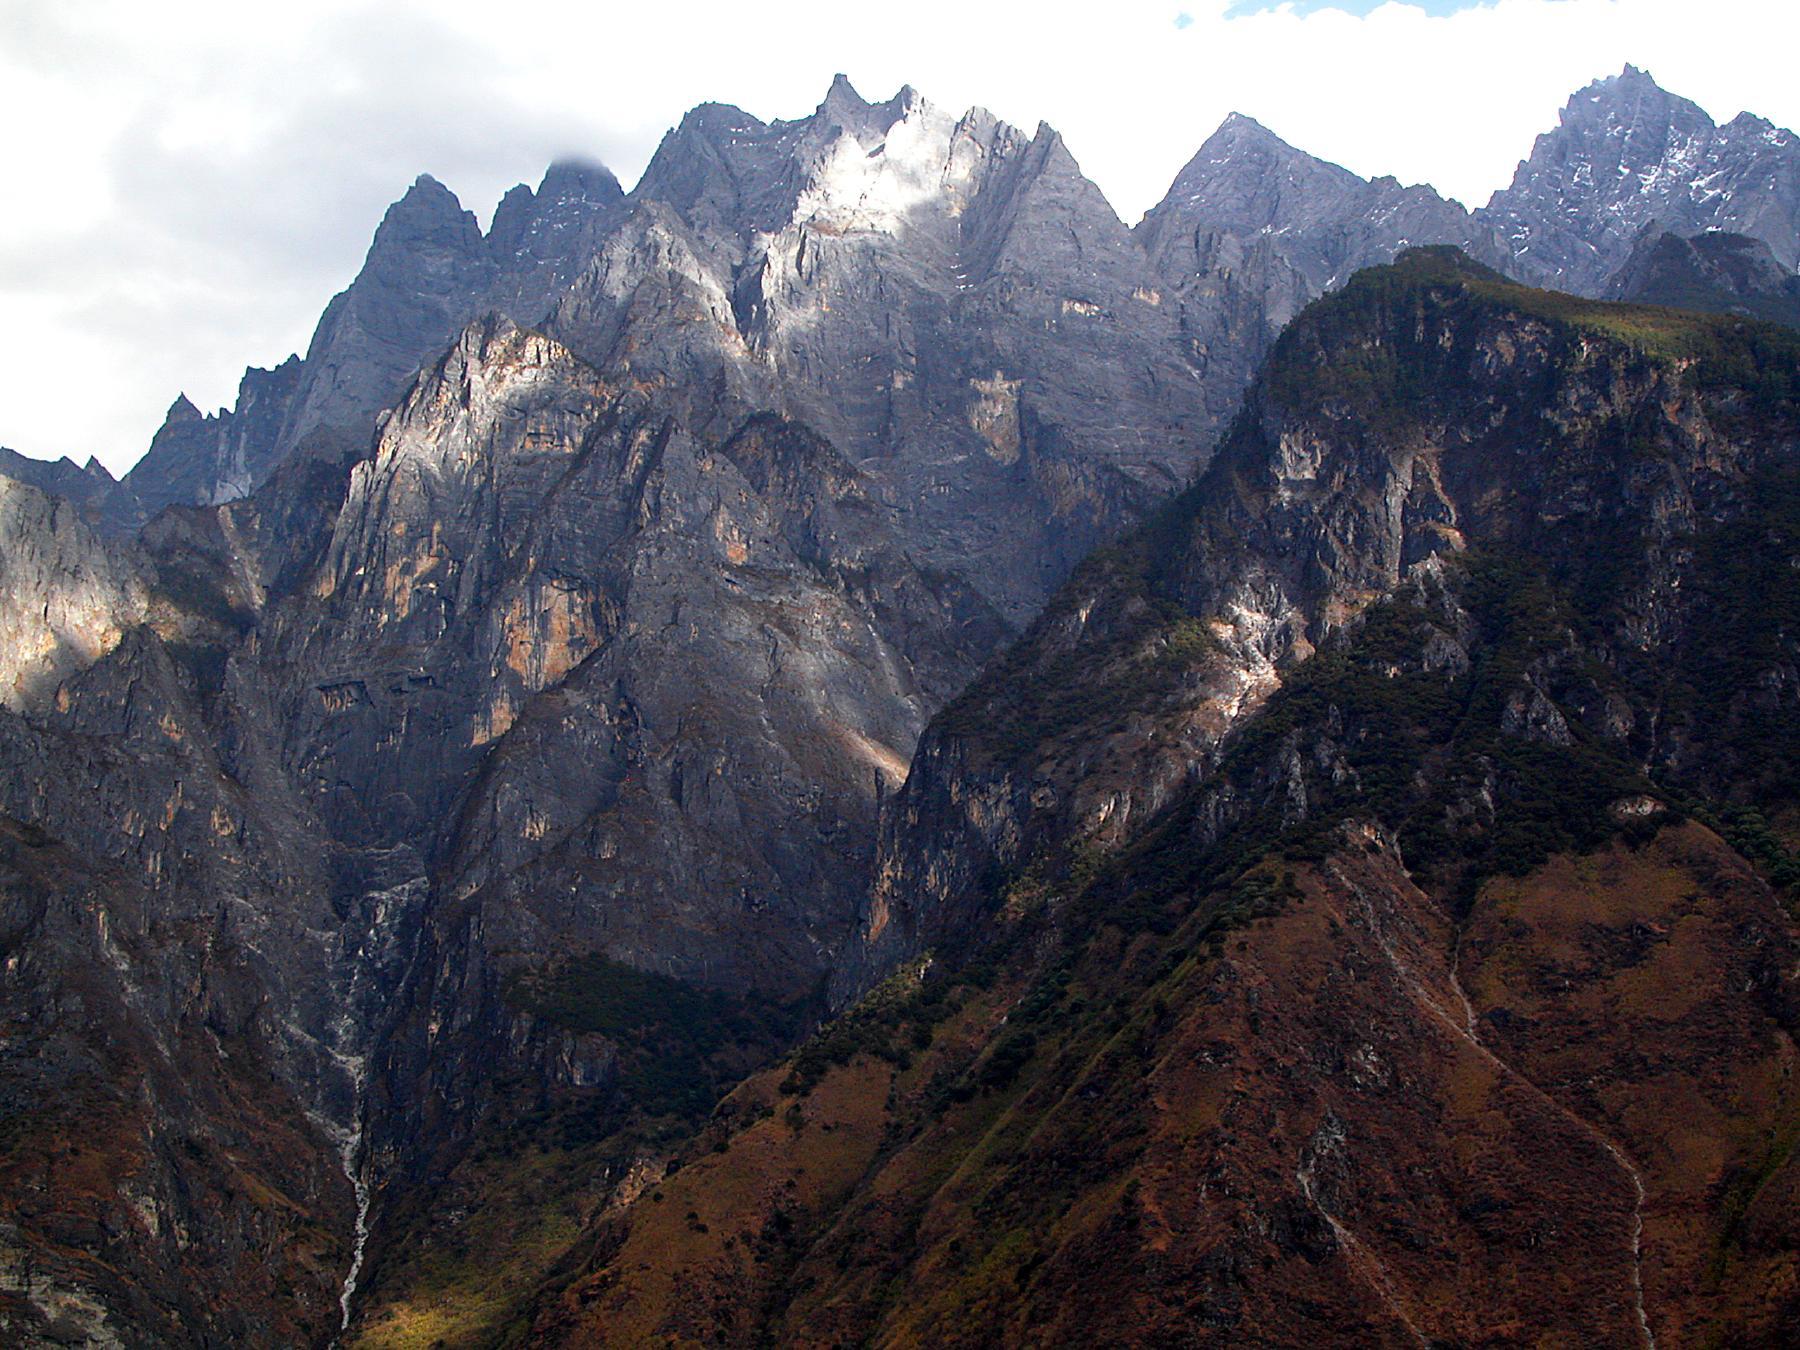 Mountains of the Yangzi River gorge Yunnan China